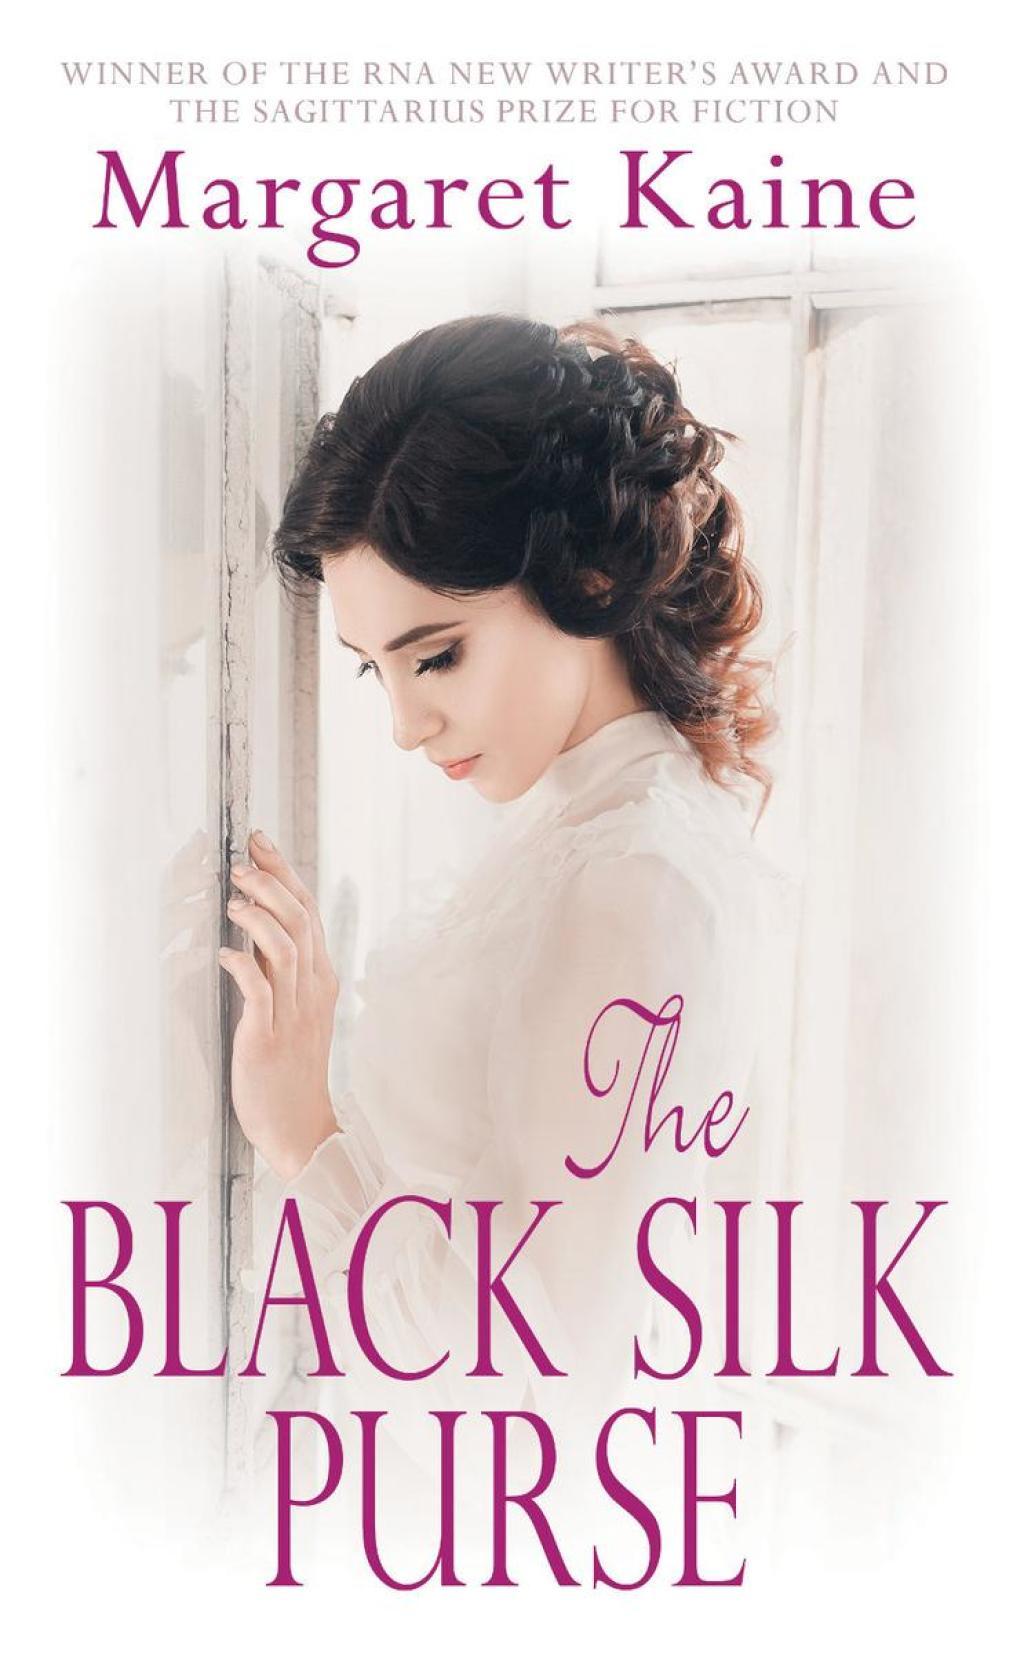 The Black Silk Purse (eBook) (9780749023157) photo